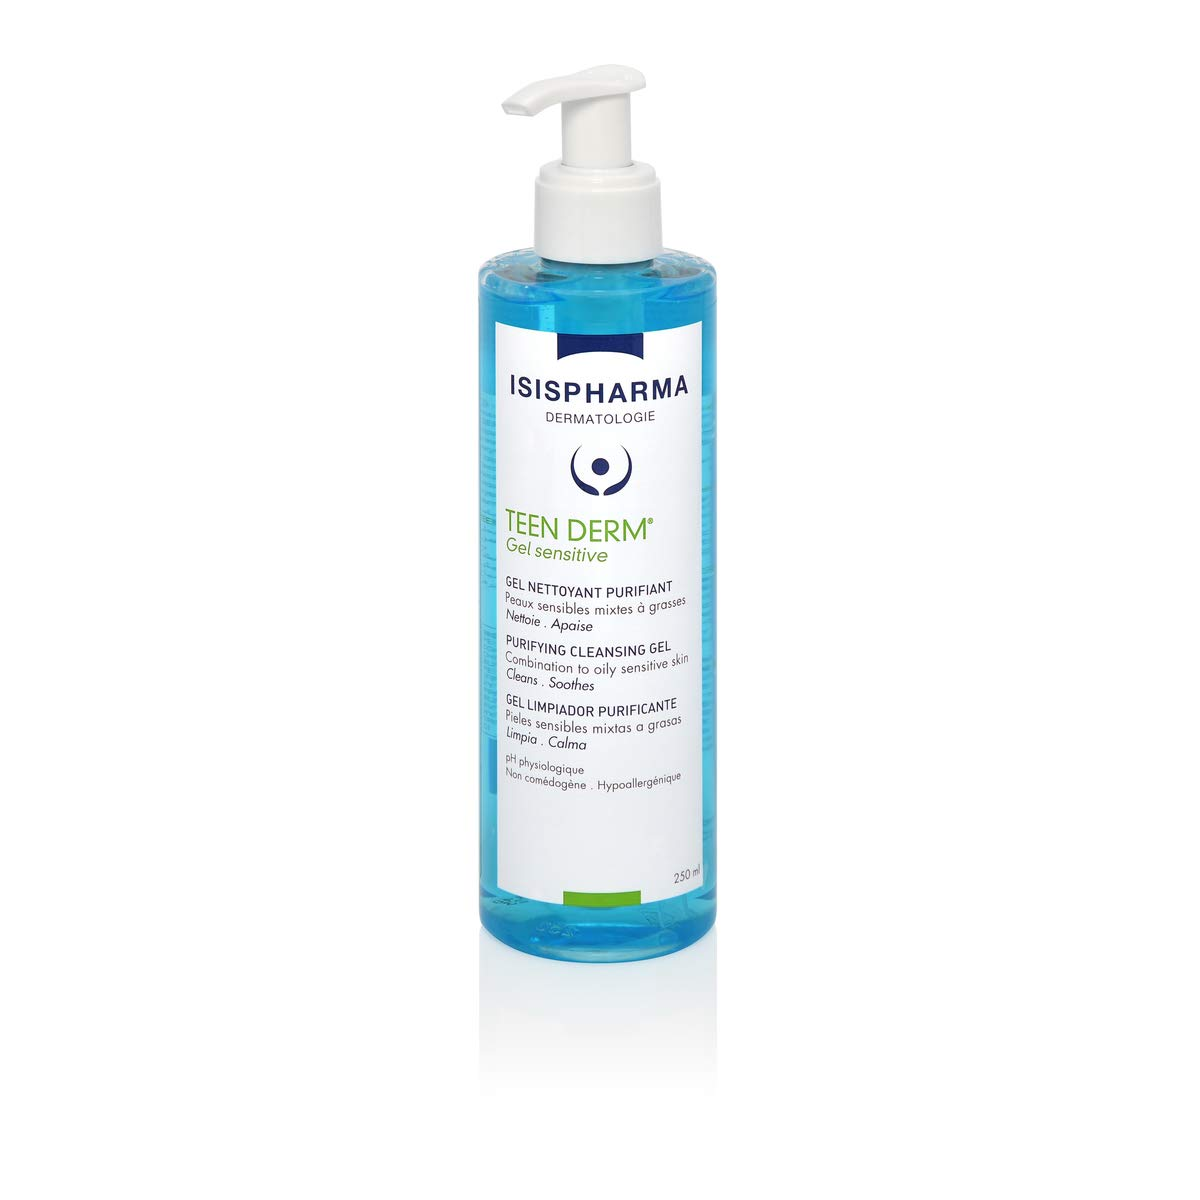 Face Wash Untuk Kulit Berjerawat? Cek Rekomendasi Berikut Ini, Yuk! 7